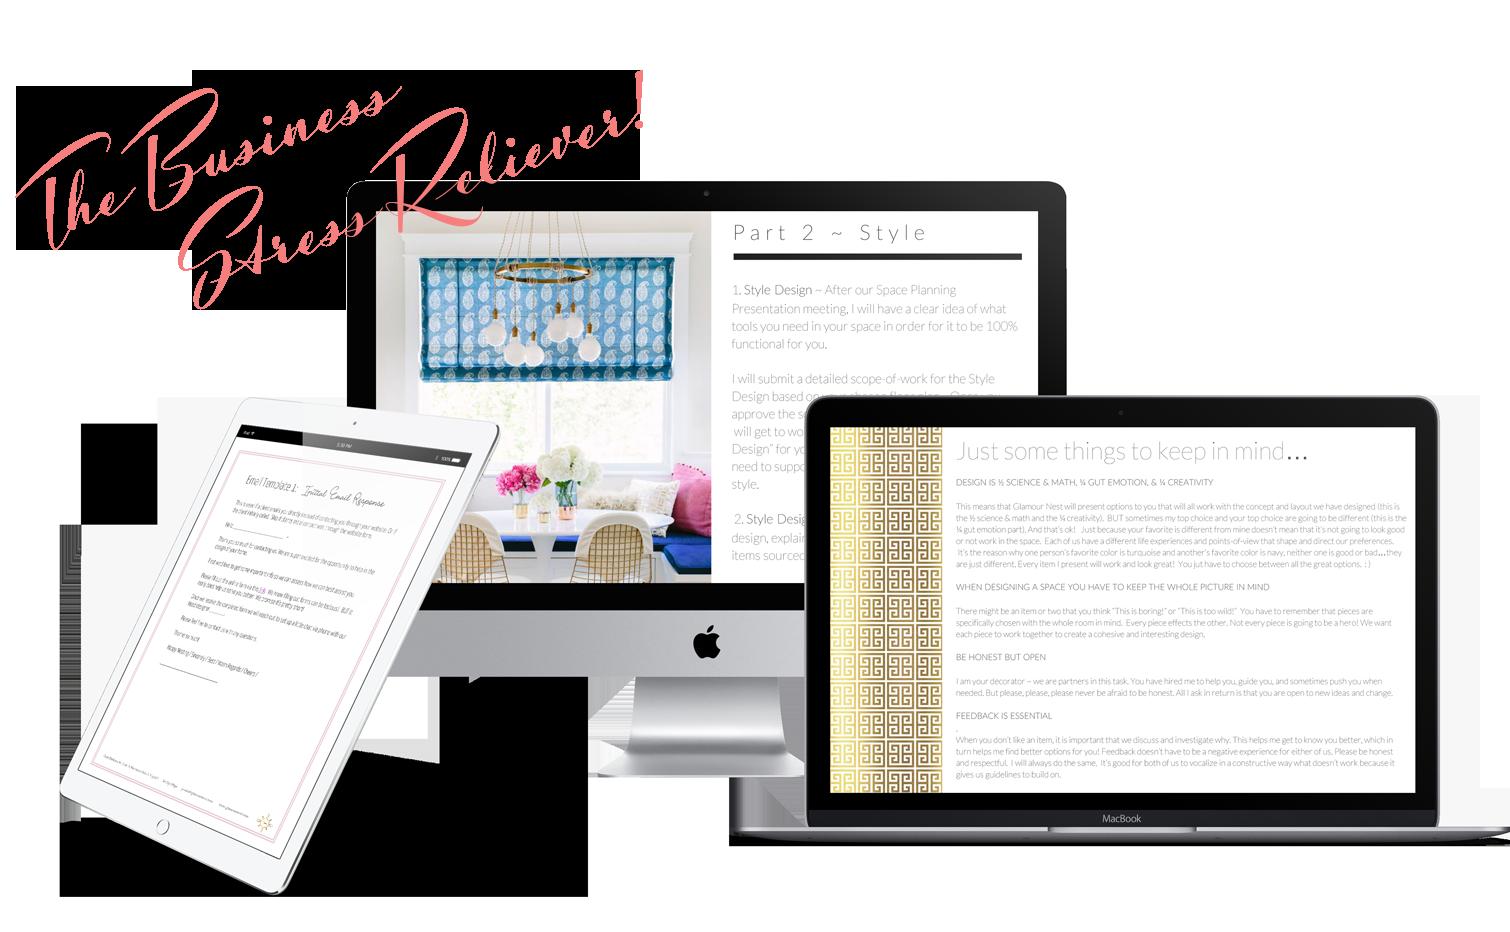 Interior design business templates | Ms. Glamour Nest Interior Design Business Coaching and Consulting